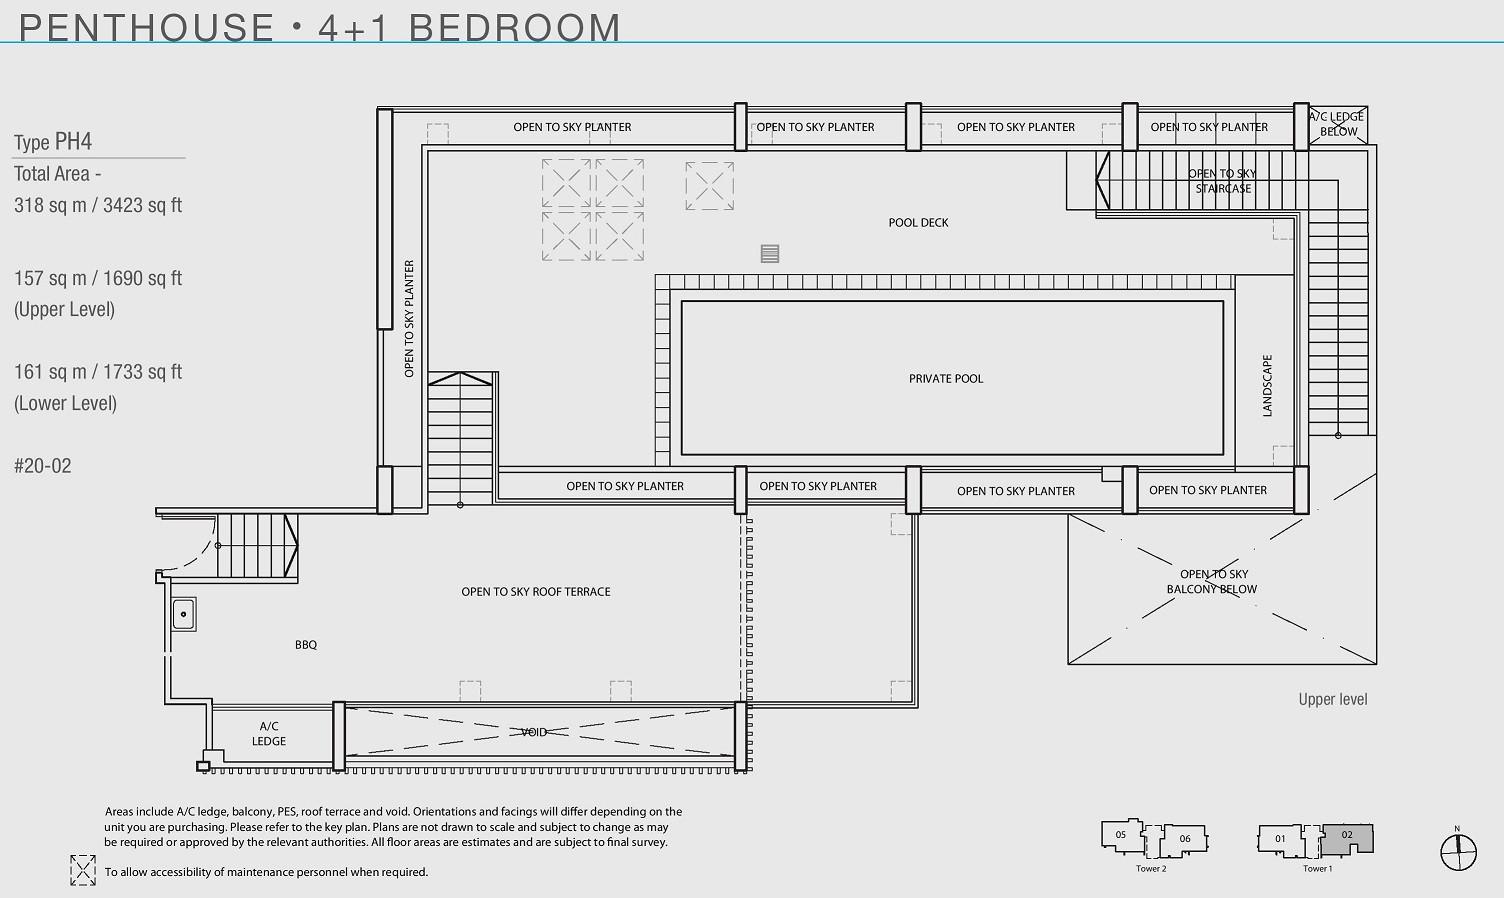 The Line _ Tanjong Rhu 4+1 Penthouse TyThe Line _ Tanjong Rhu 4+1 Penthouse Type PH4 (Upper Level)pe PH4 (Upper Level)